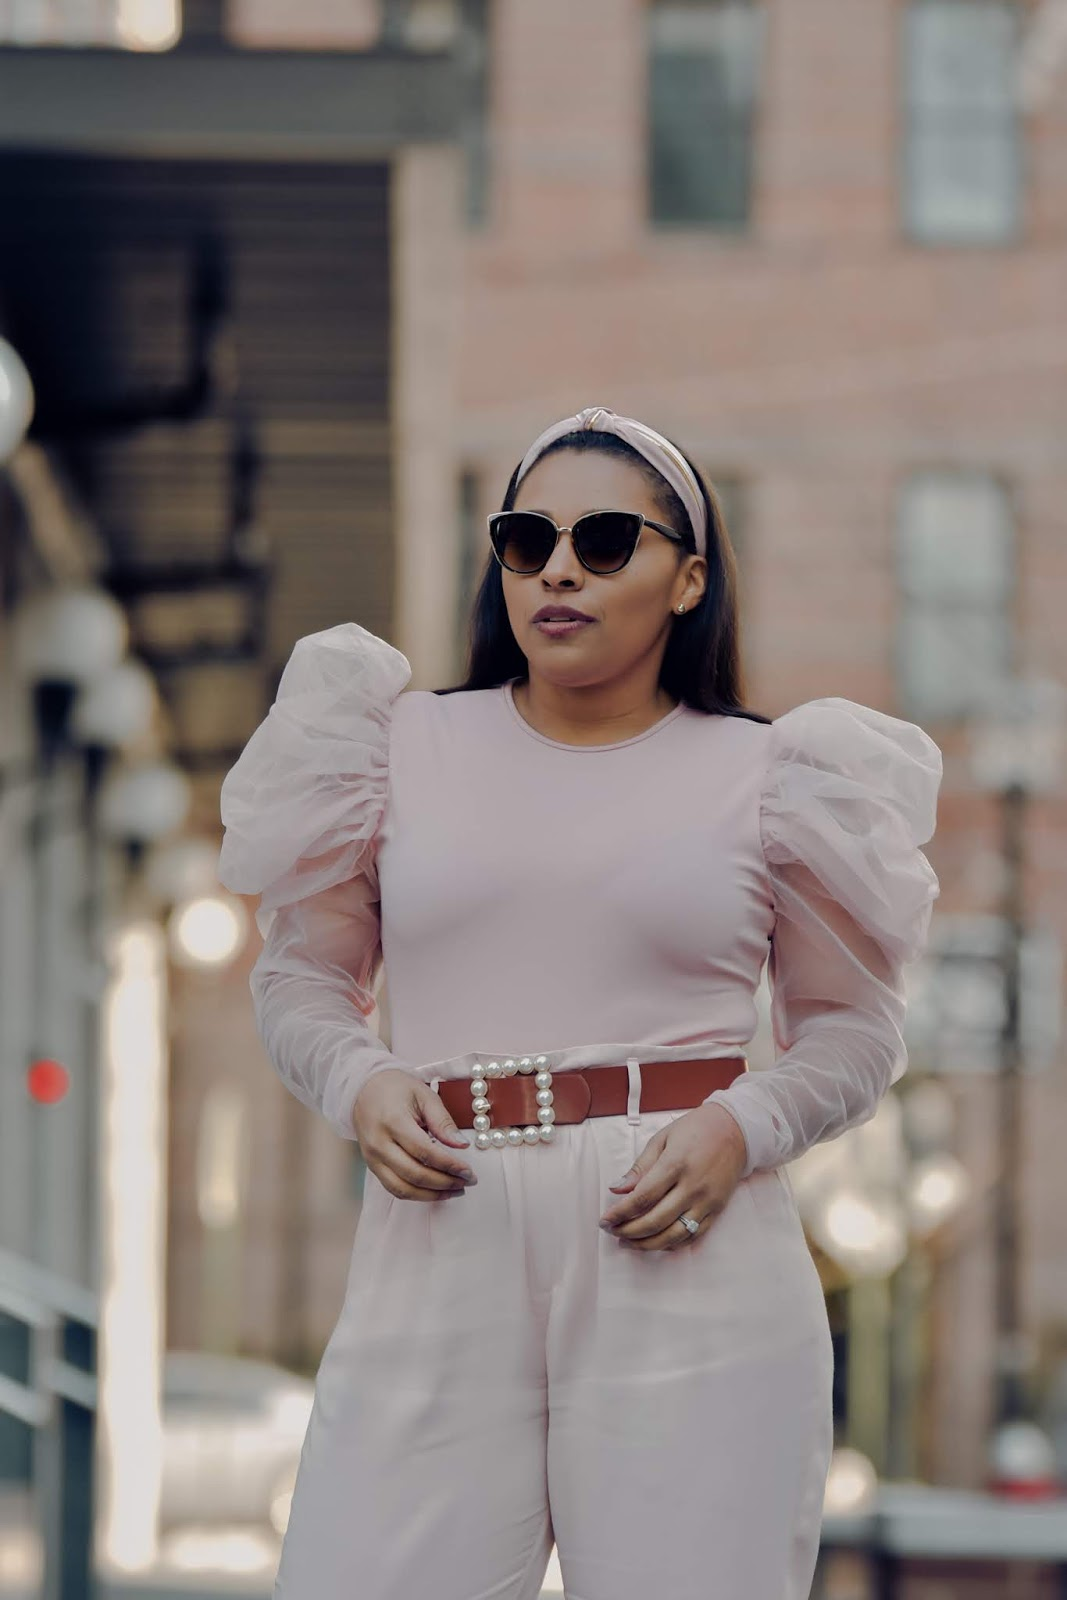 shein, shein review, nyfw, nyfw streetstyle, fashion week